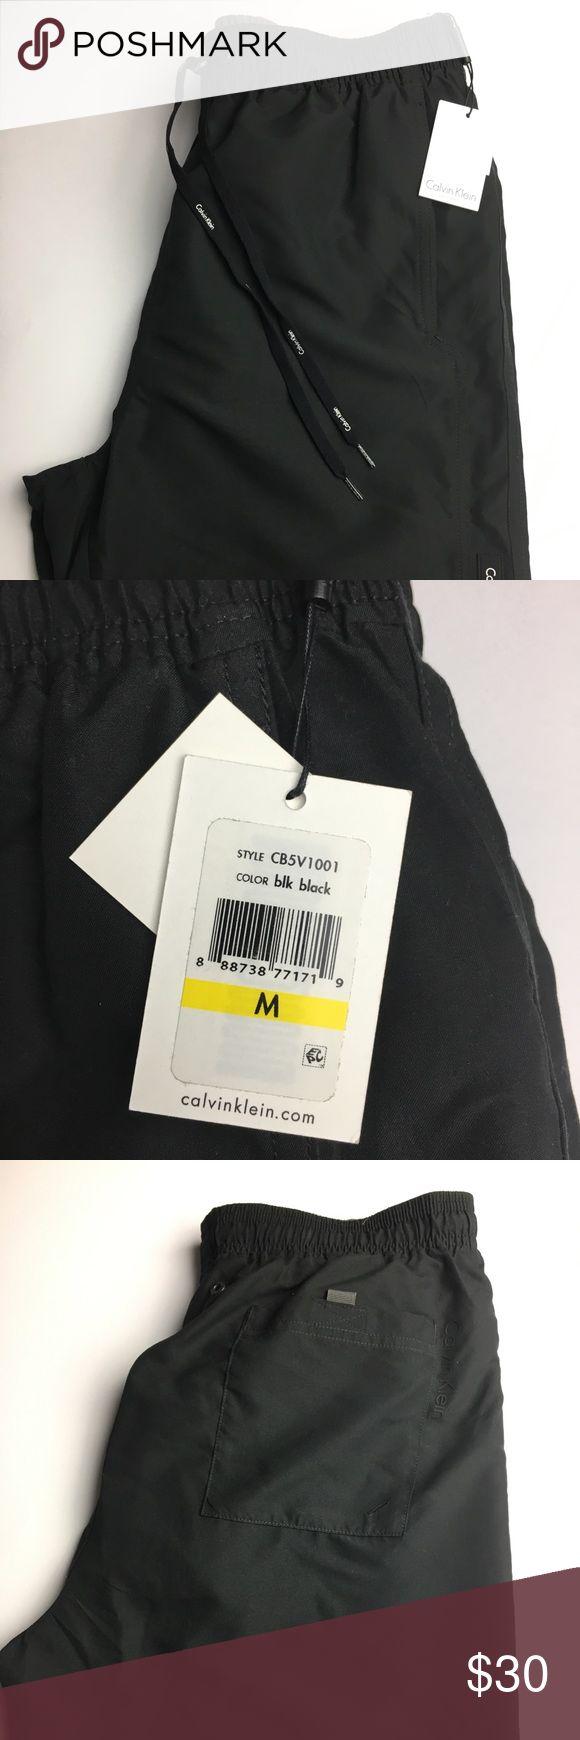 Calvin Klein Swim Shorts Black swim shorts with elastic plus drawstring waist. One back pocket with Velcro closure. Calvin Klein Swim Swim Trunks